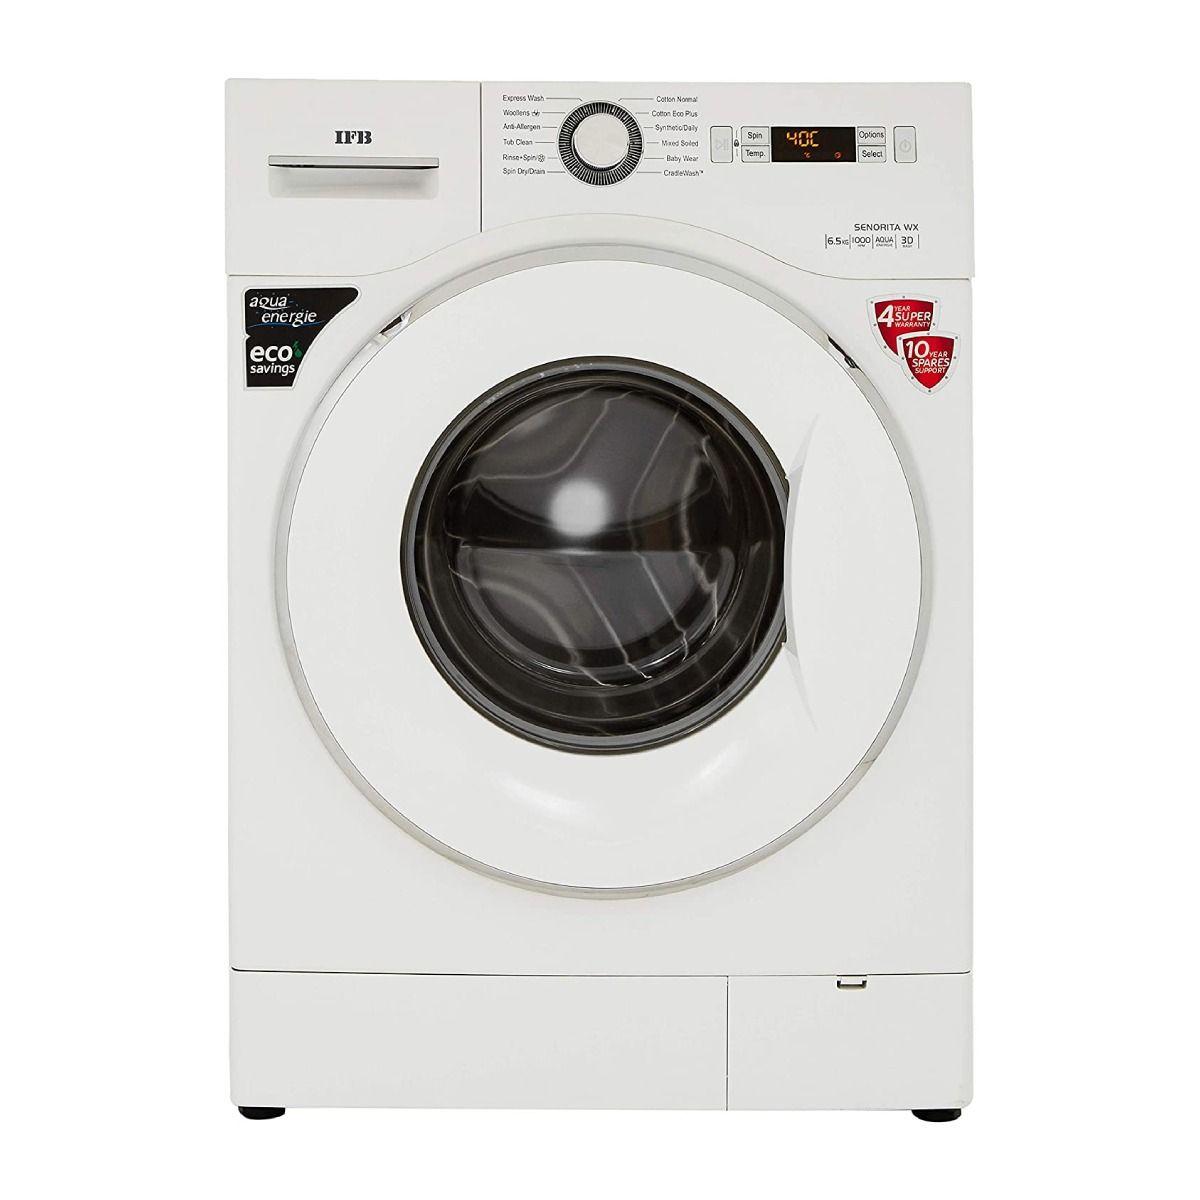 आयएफबी 6.5 kg Fully-Automatic Front Loading Washing Machine Silver (Senorita Aqua SX)